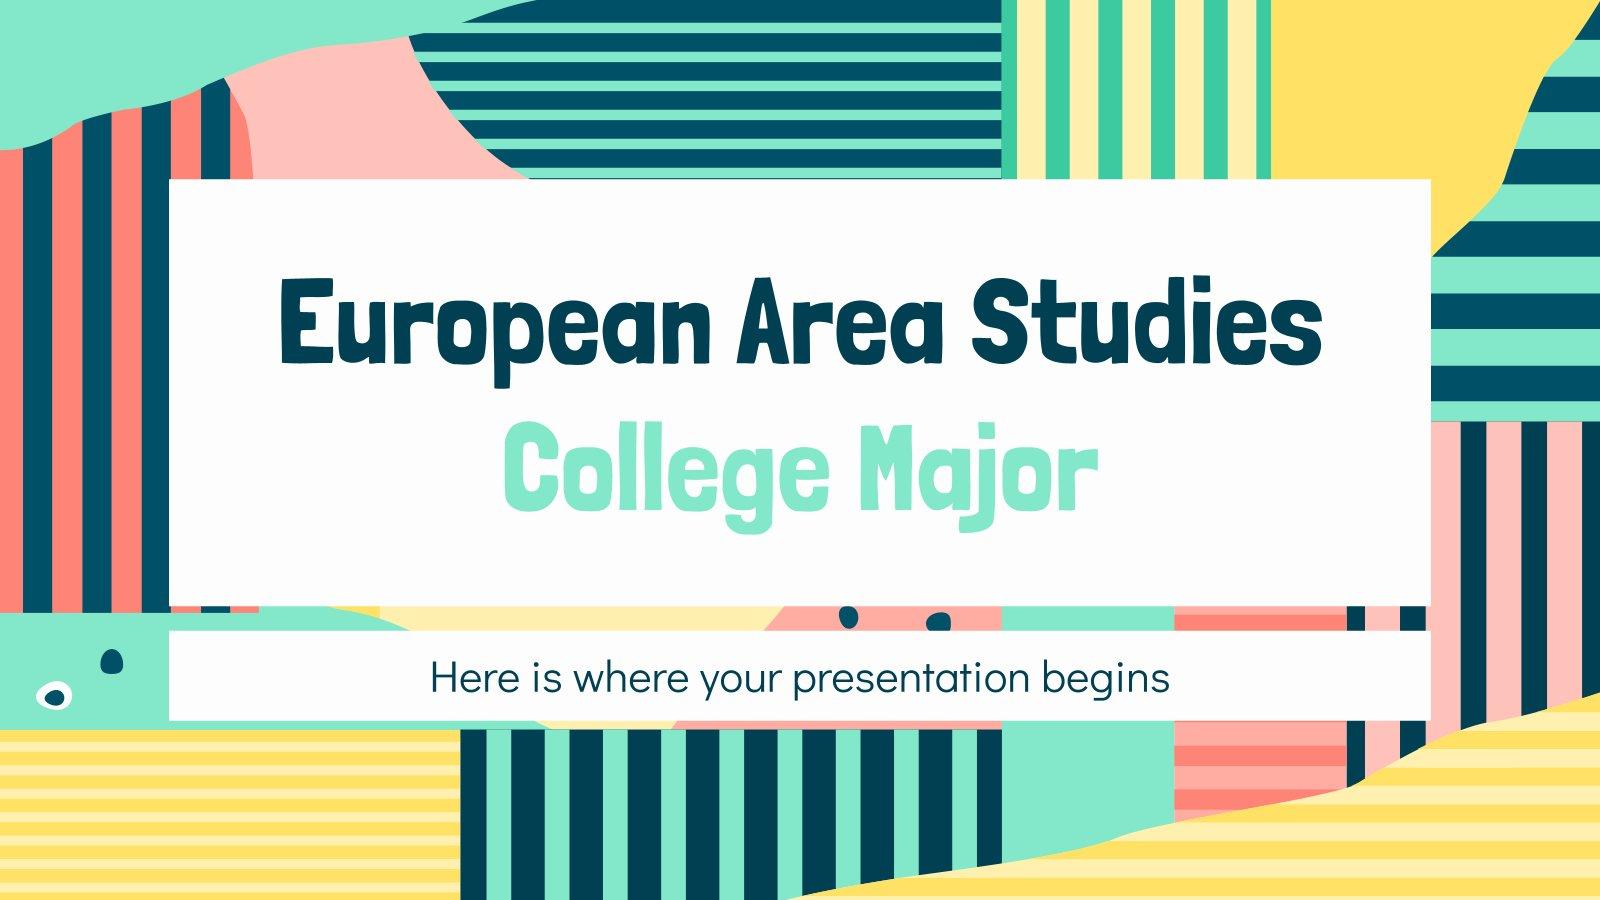 European Area Studies College Major presentation template